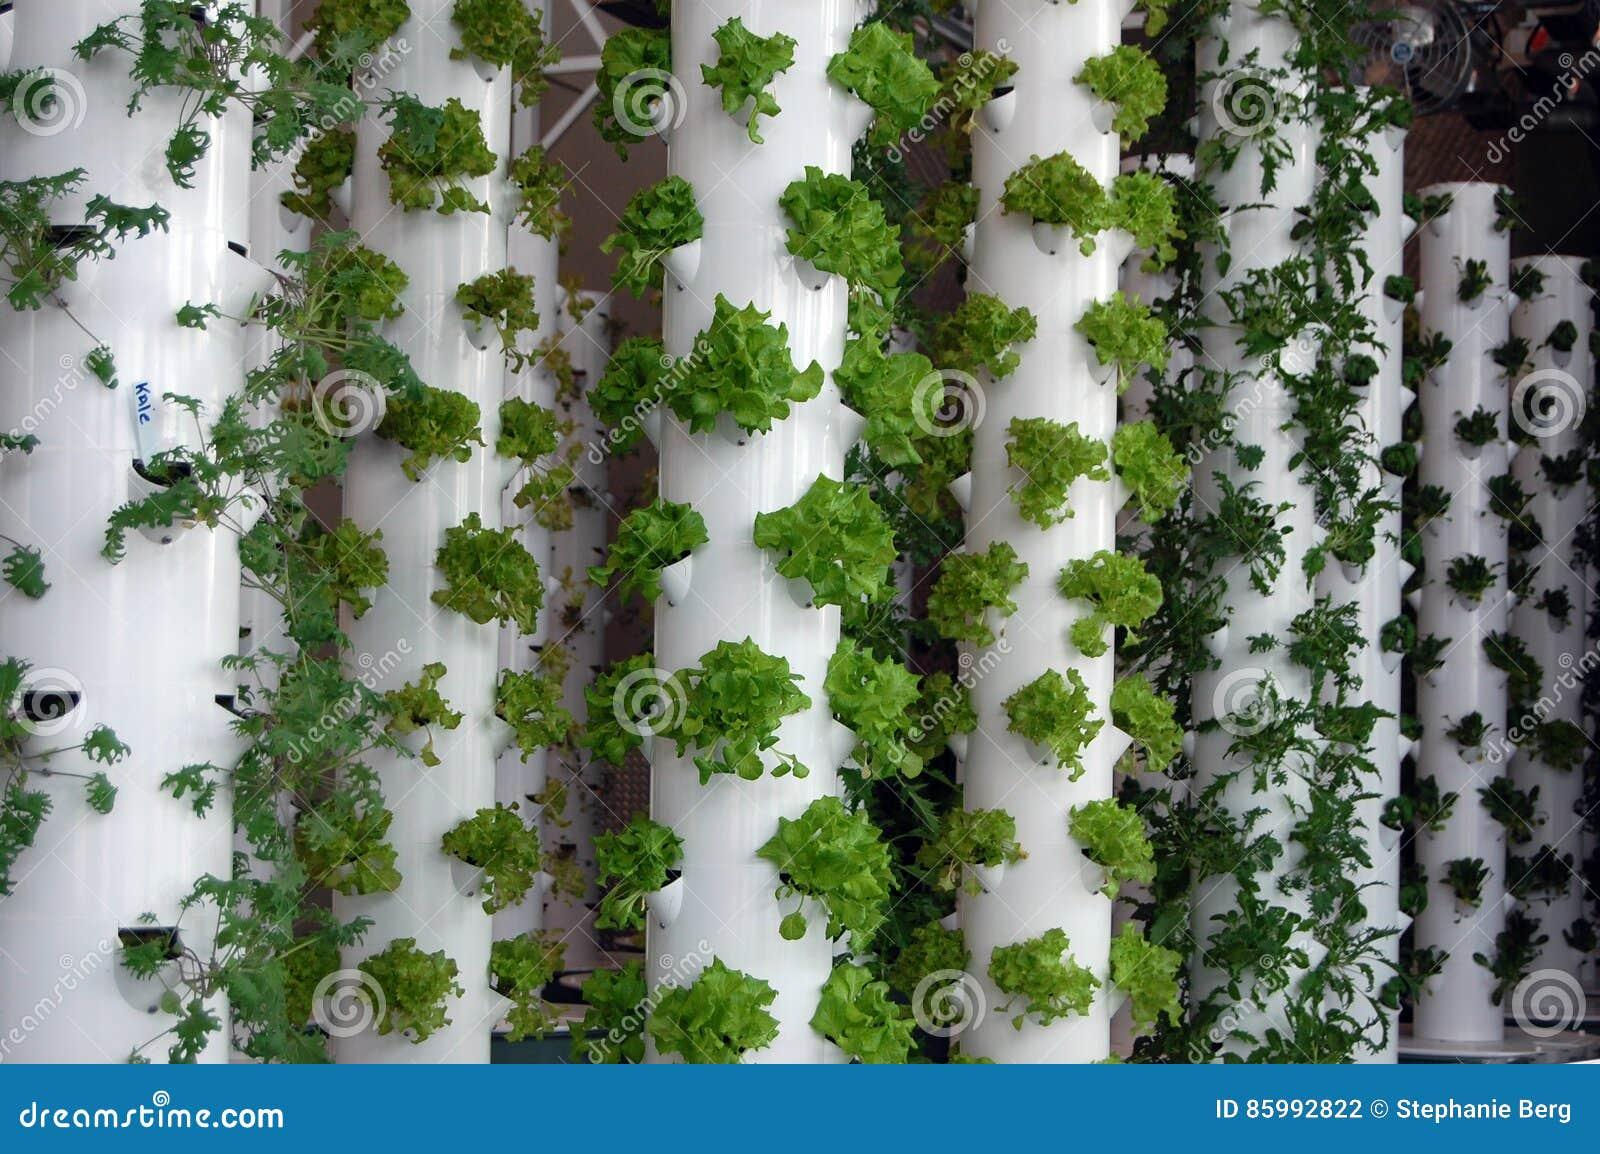 Organic Hydroponic Herbs